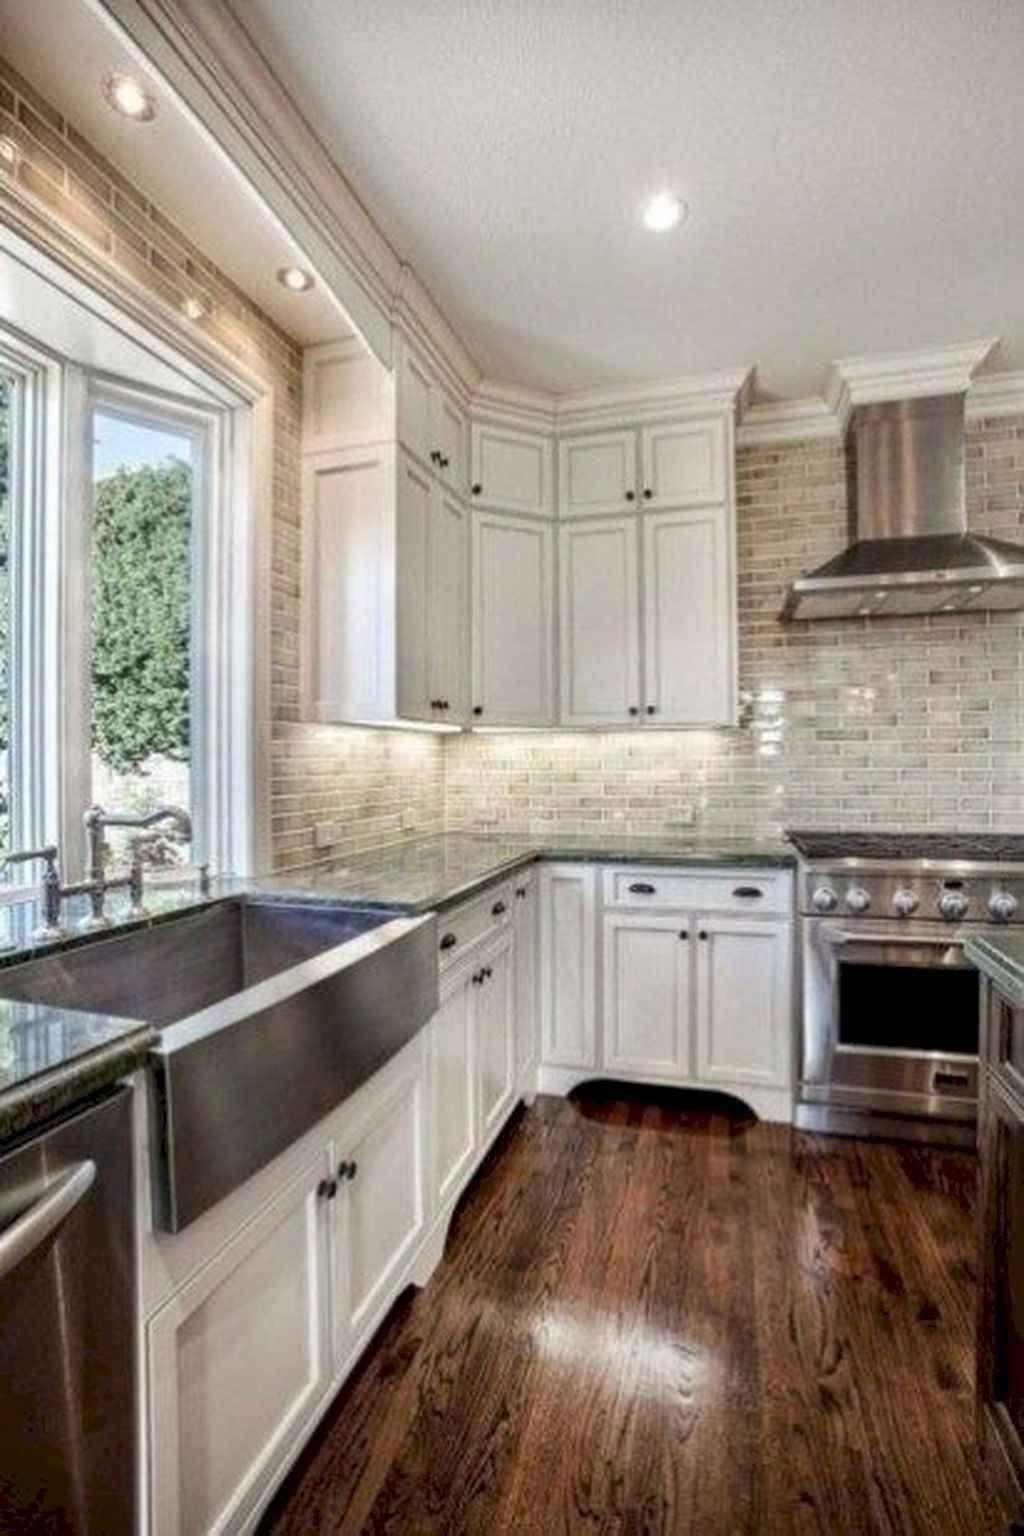 70 Beautiful White Kitchen Cabinet Makeover Ideas In 2020 Refacing Kitchen Cabinets Farmhouse Kitchen Remodel New Kitchen Cabinets